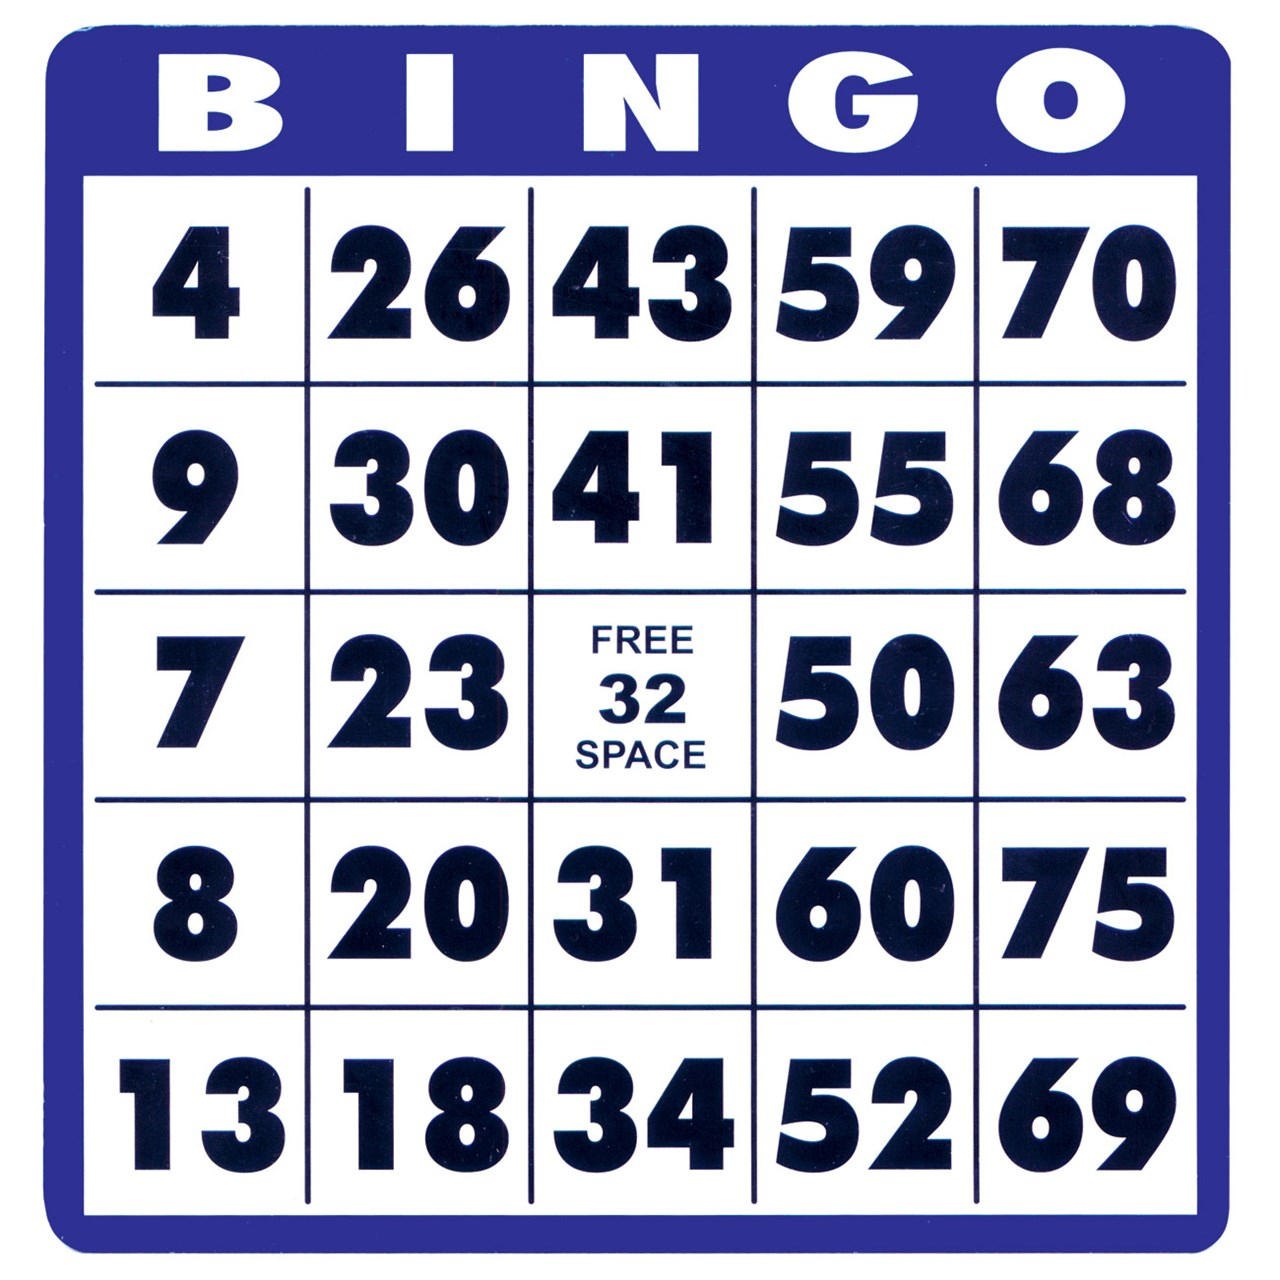 Low Vision Bingo Cards -10 Cards